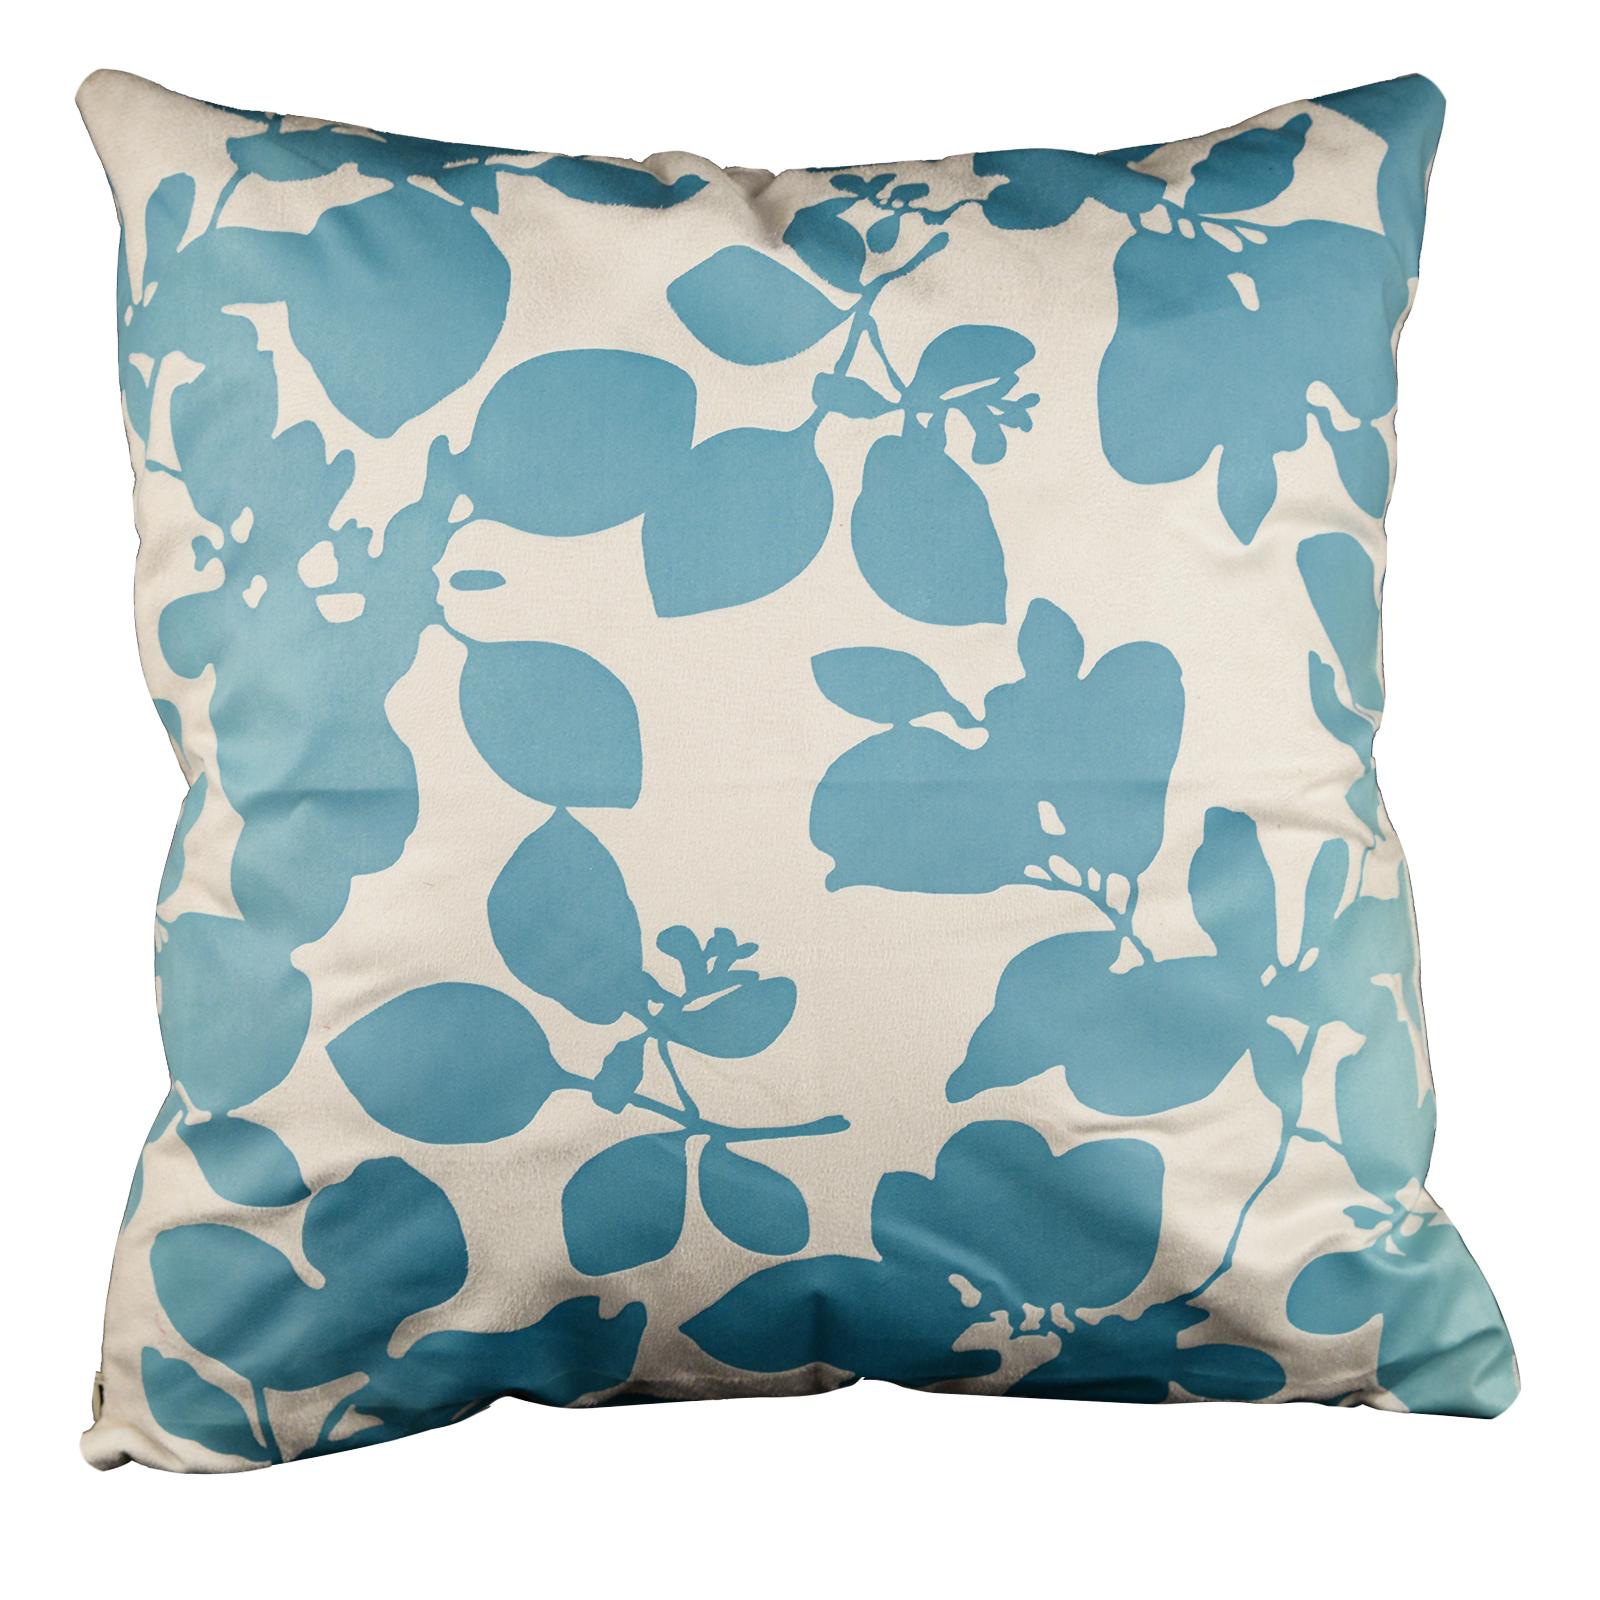 kissenbezug kissenh lle mit rei verschluss kopfkissen wildleder leder optik 146 ebay. Black Bedroom Furniture Sets. Home Design Ideas